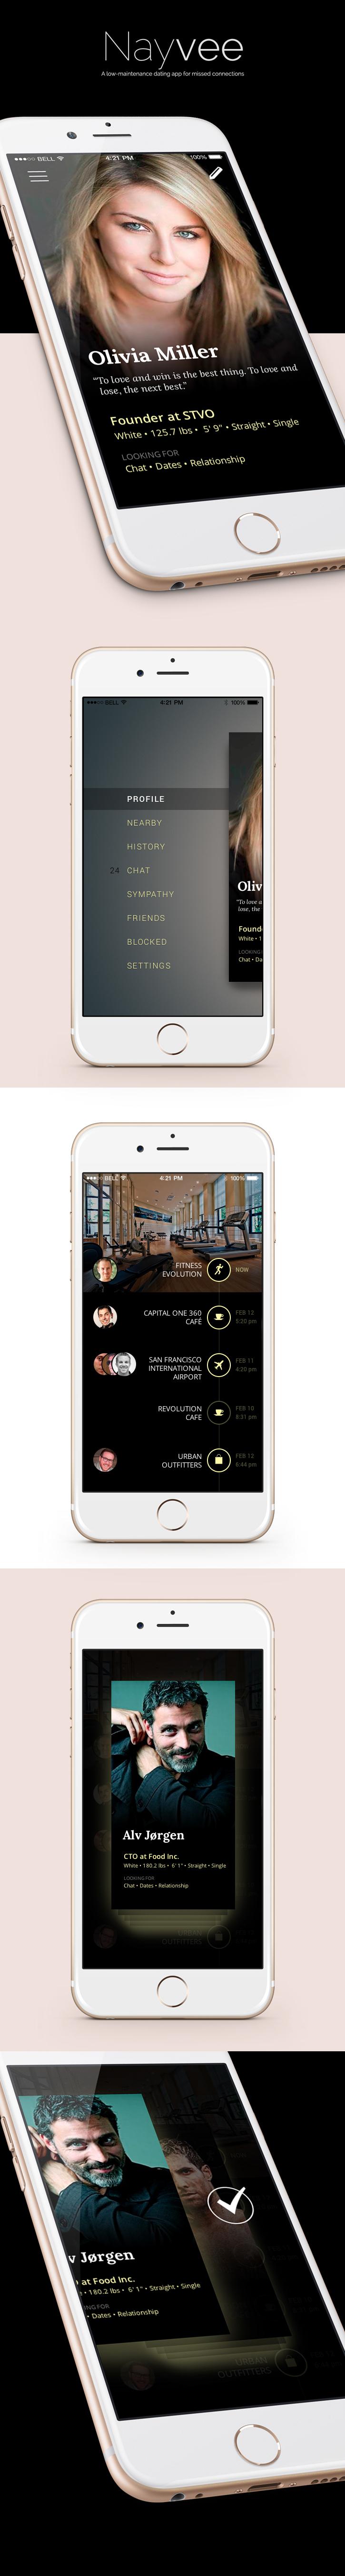 lbs dating app